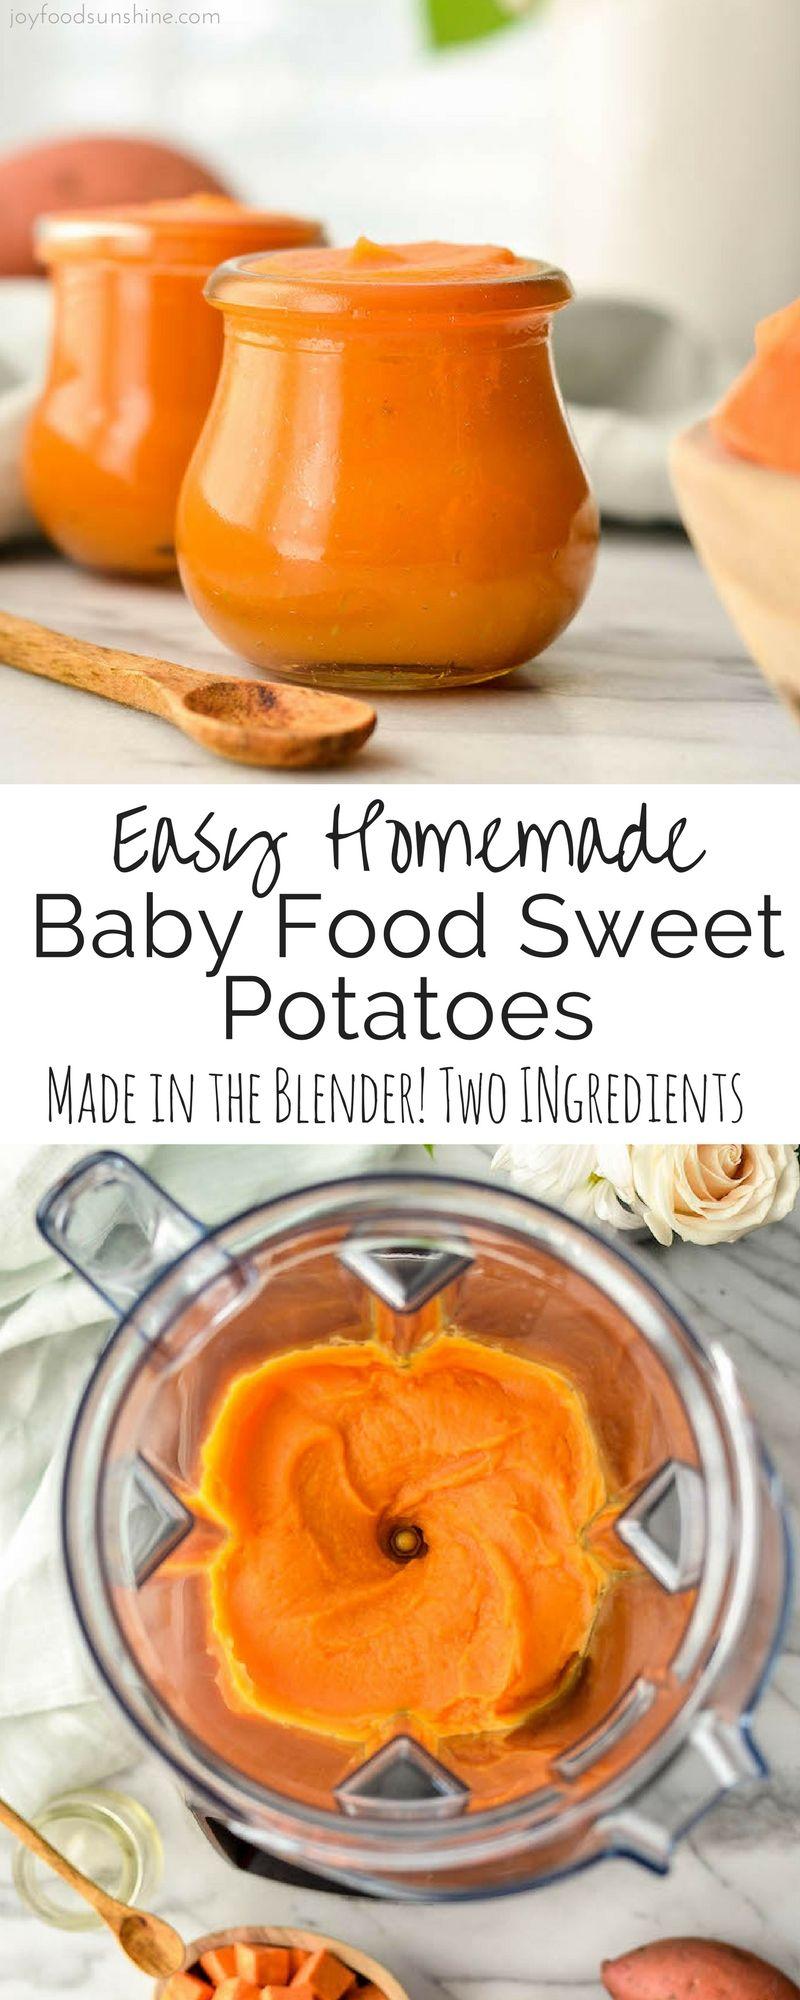 Easy Homemade Baby Food Sweet Potatoes! This recipe has ...